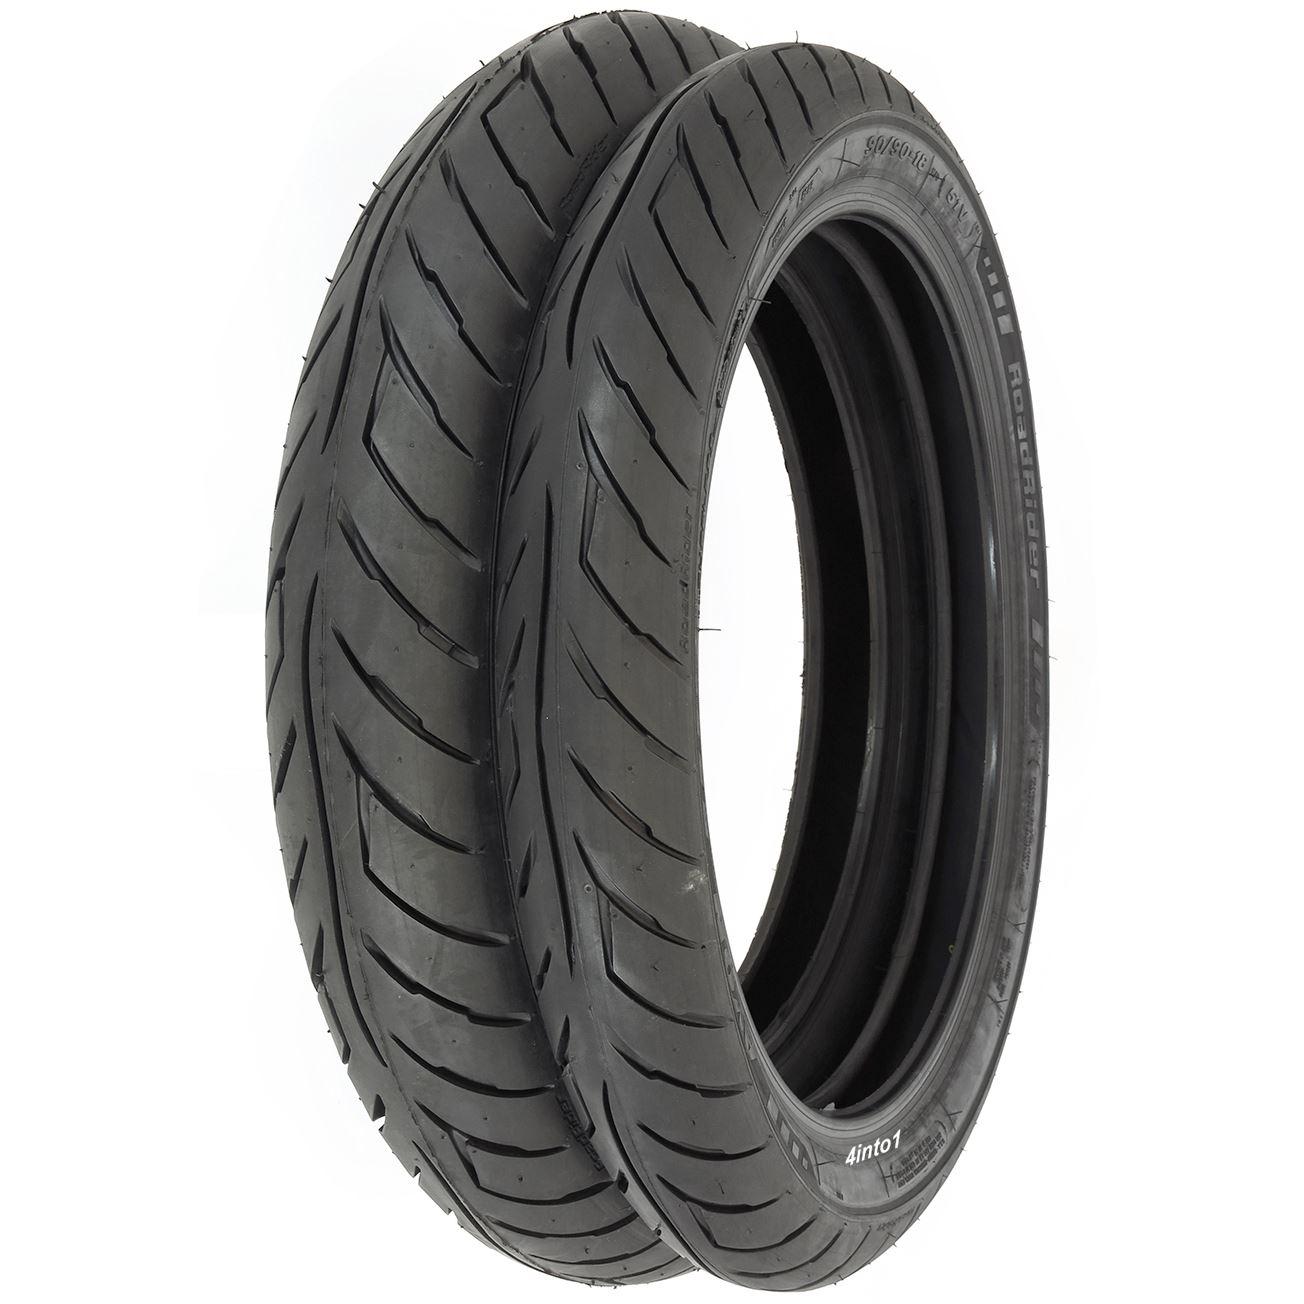 avon roadrider am26 tire set honda cl350k cb450k cl450k cb500k tires only ebay. Black Bedroom Furniture Sets. Home Design Ideas